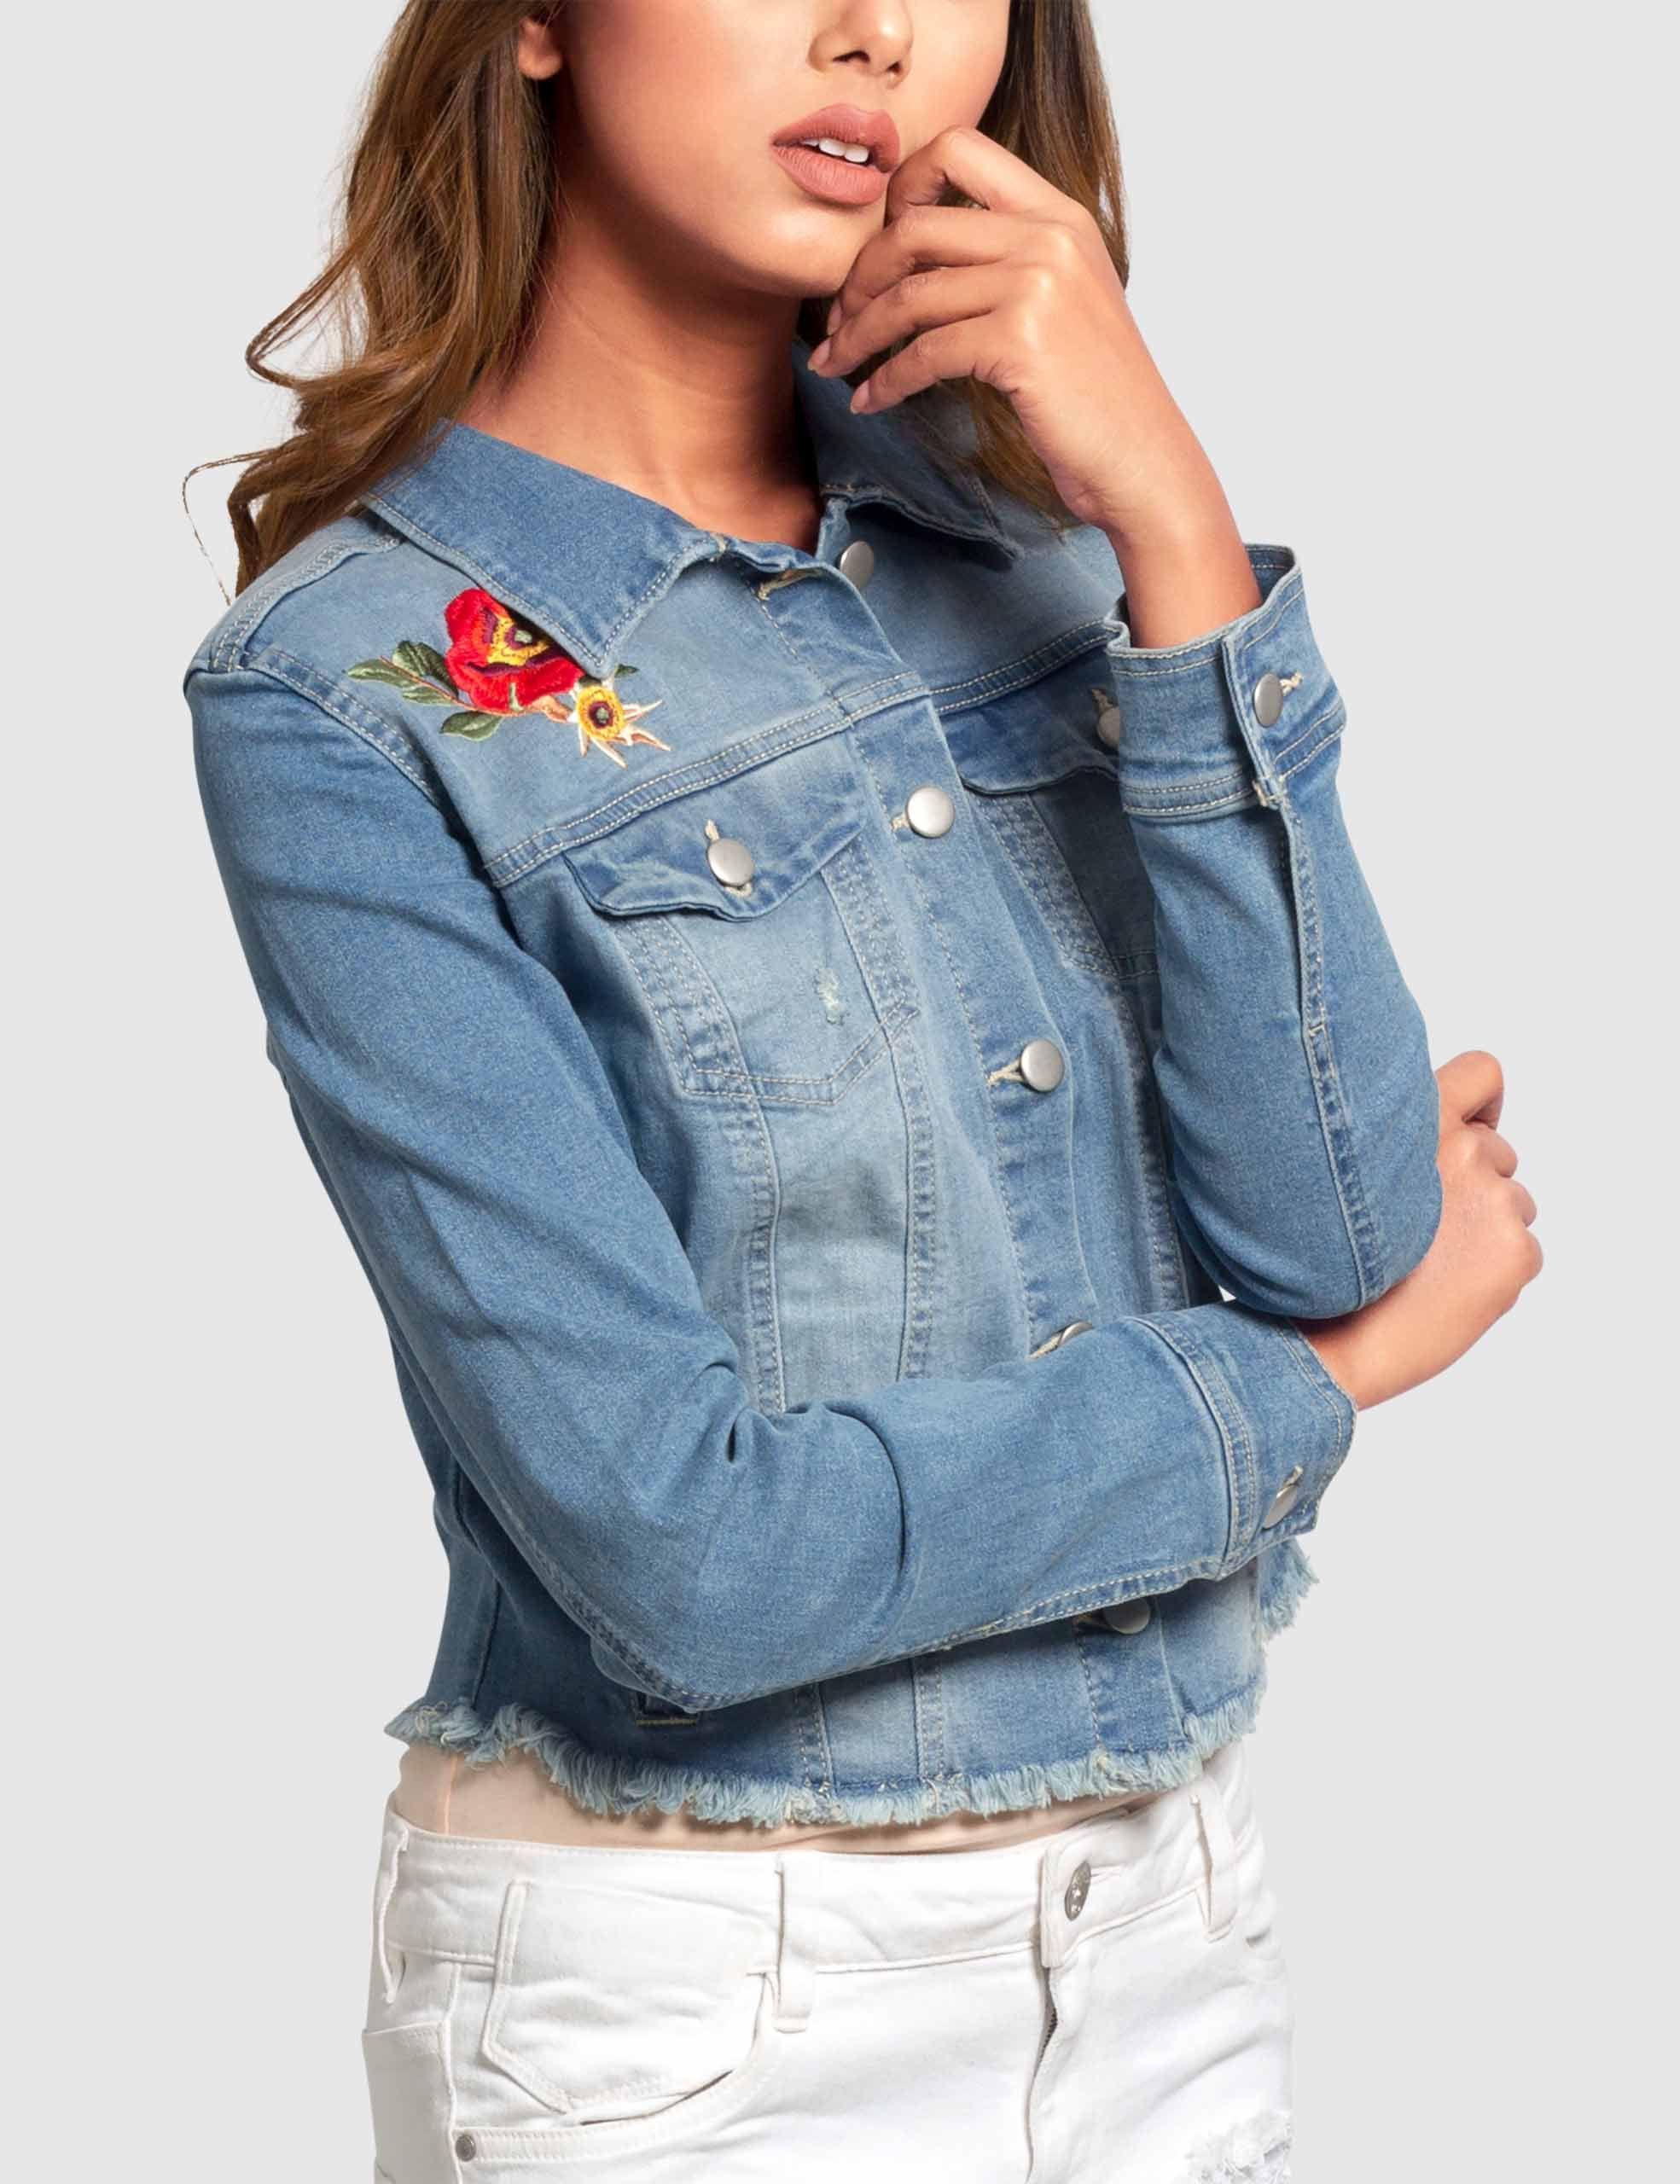 Womens Denim Jacket Embroidery Women S Jackets Coats Blazers